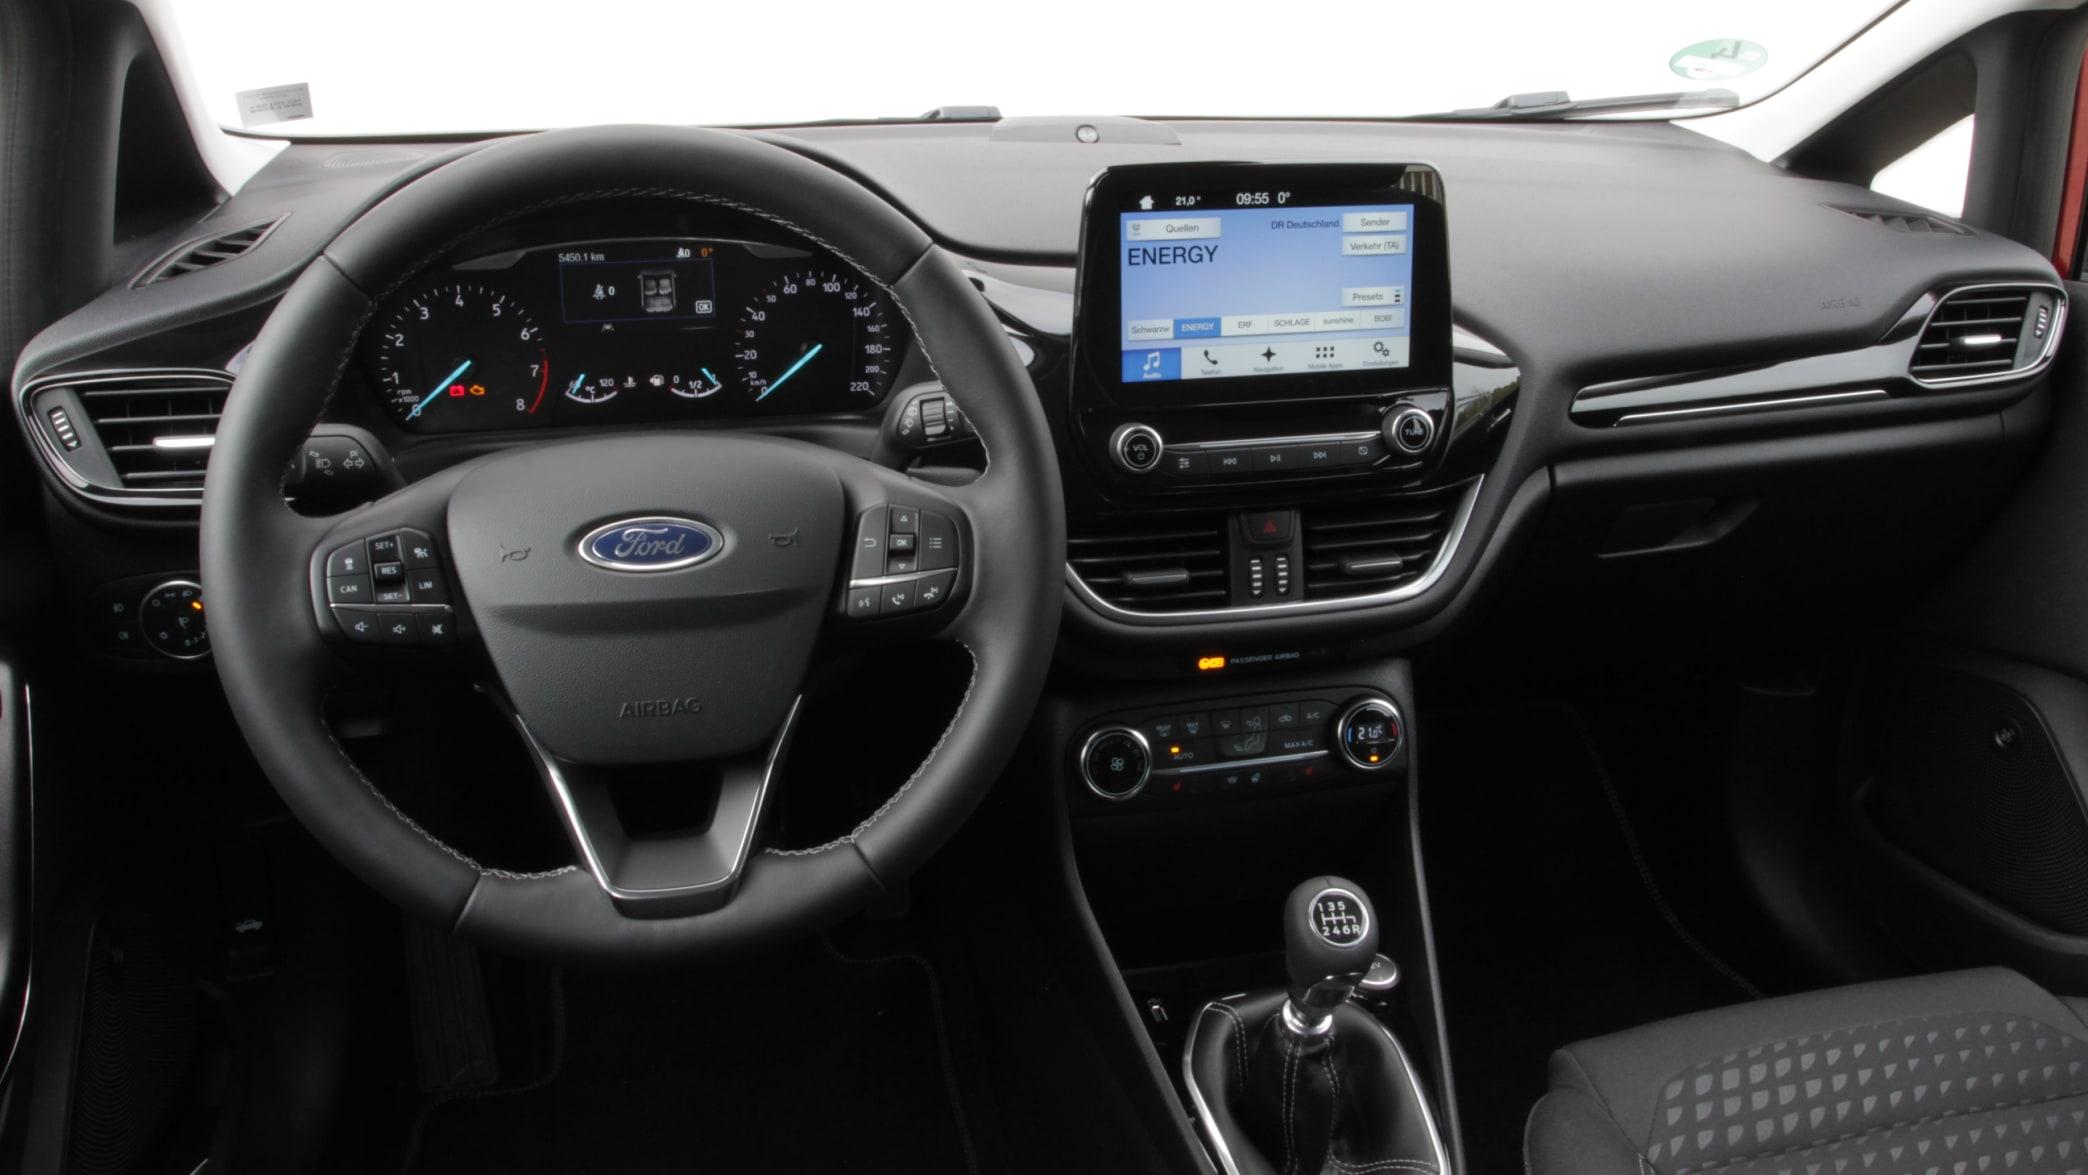 Ford Fiesta Cockpit